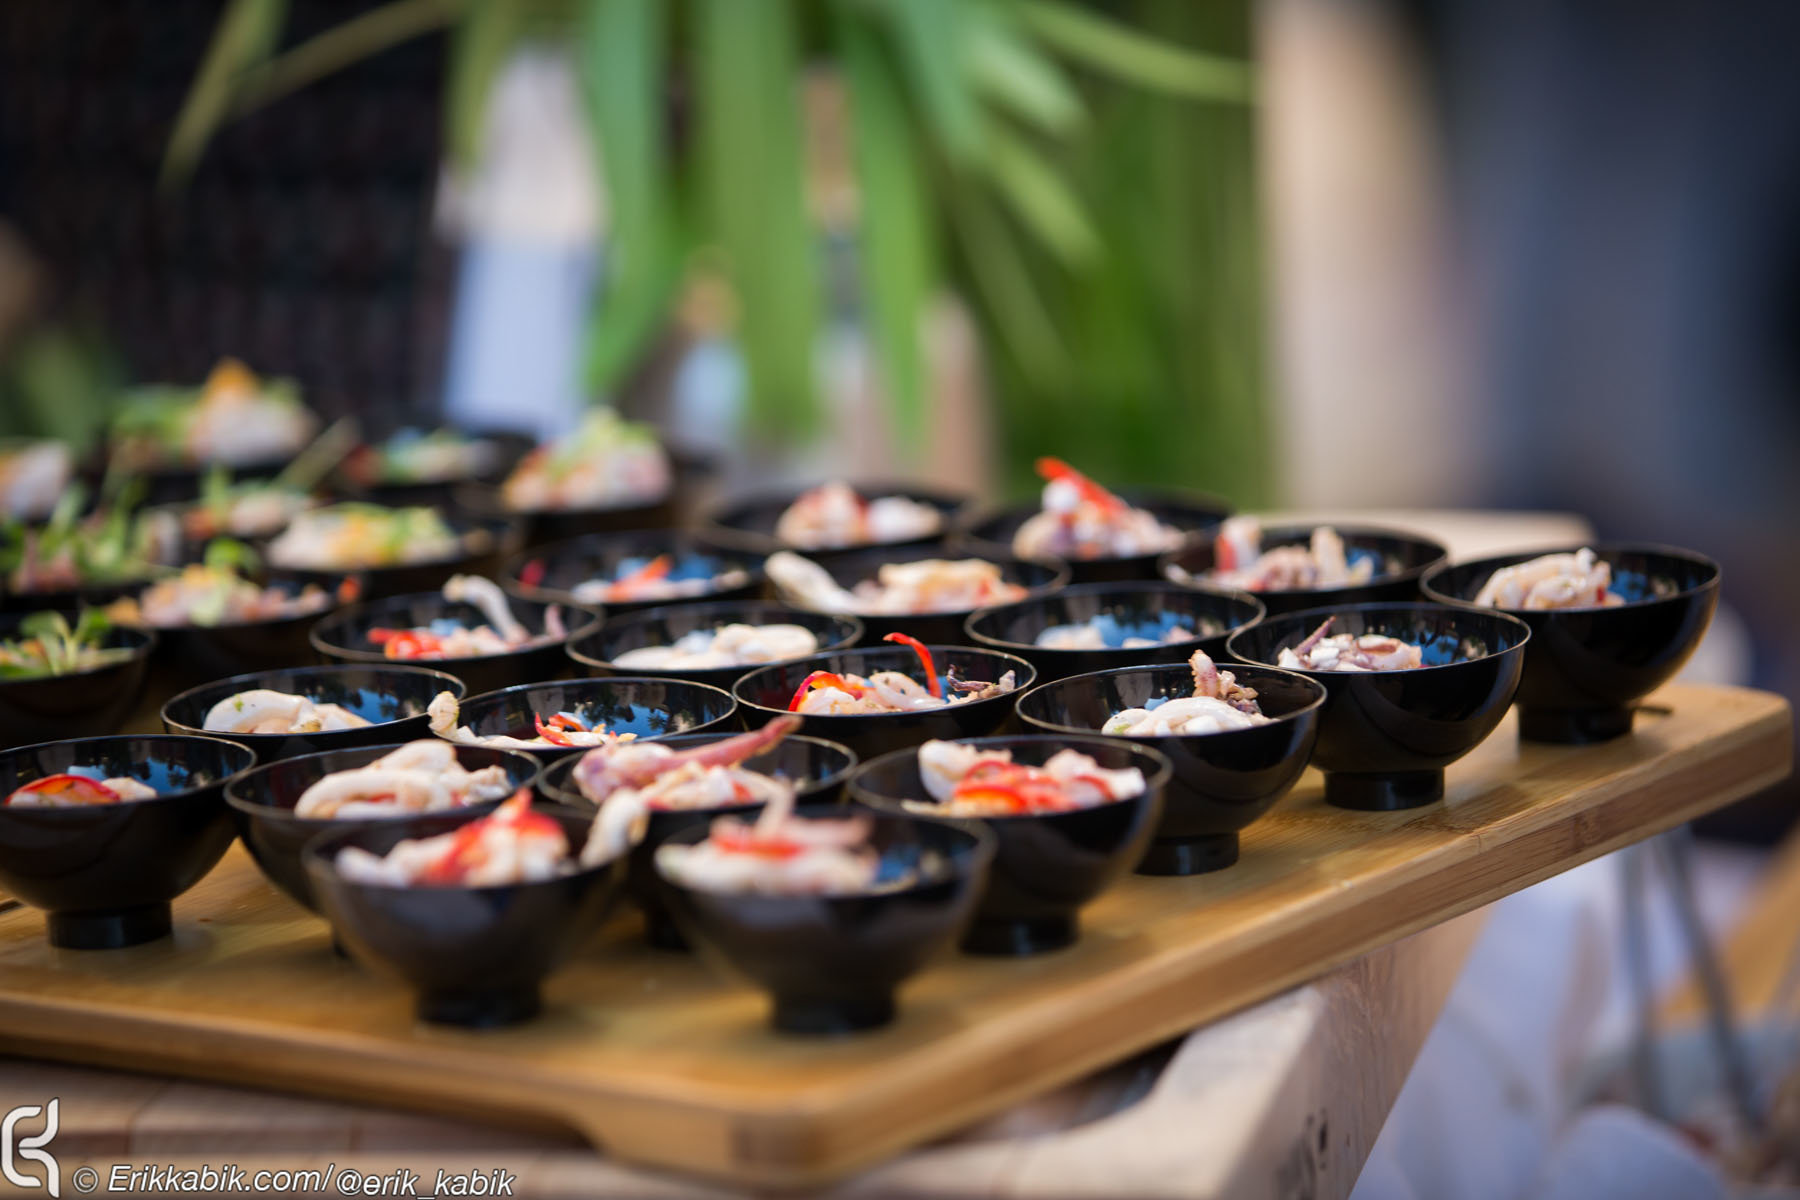 6_5_15_batali_carnival_cuisine_kabik-175.jpg